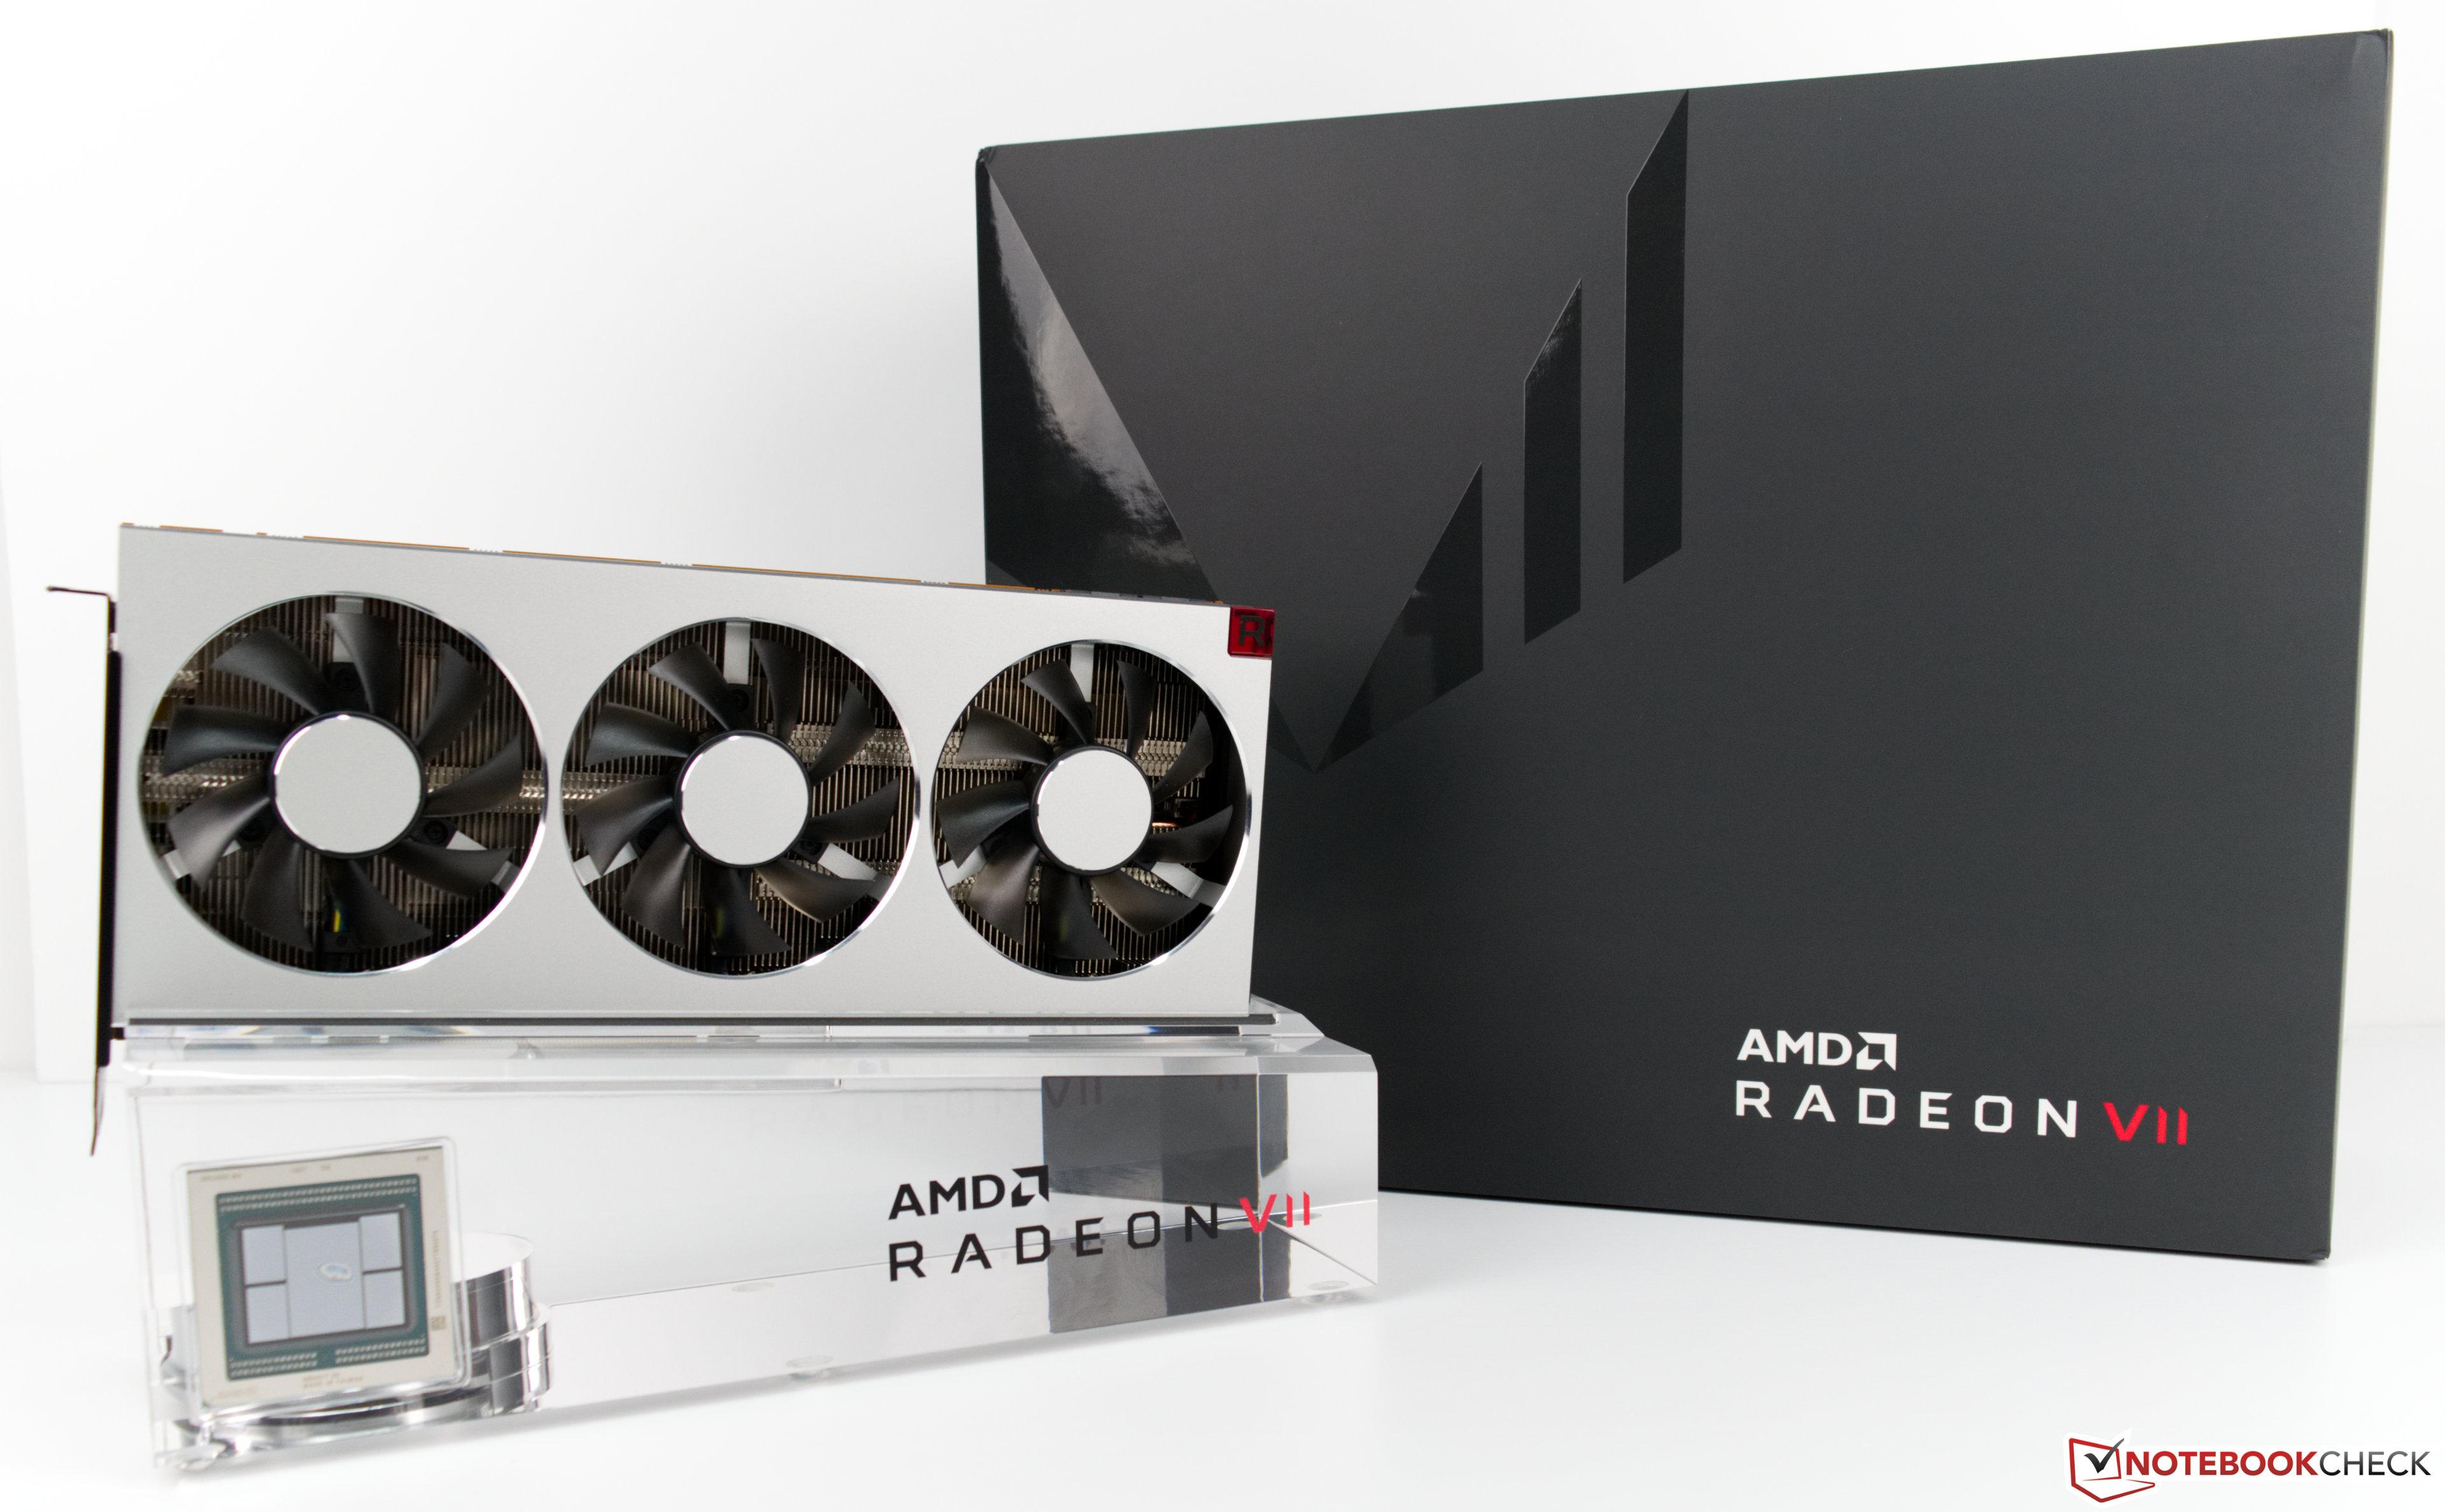 Видеокарта AMD Radeon VII  Обзор от Notebookcheck - Notebookcheck-ru com